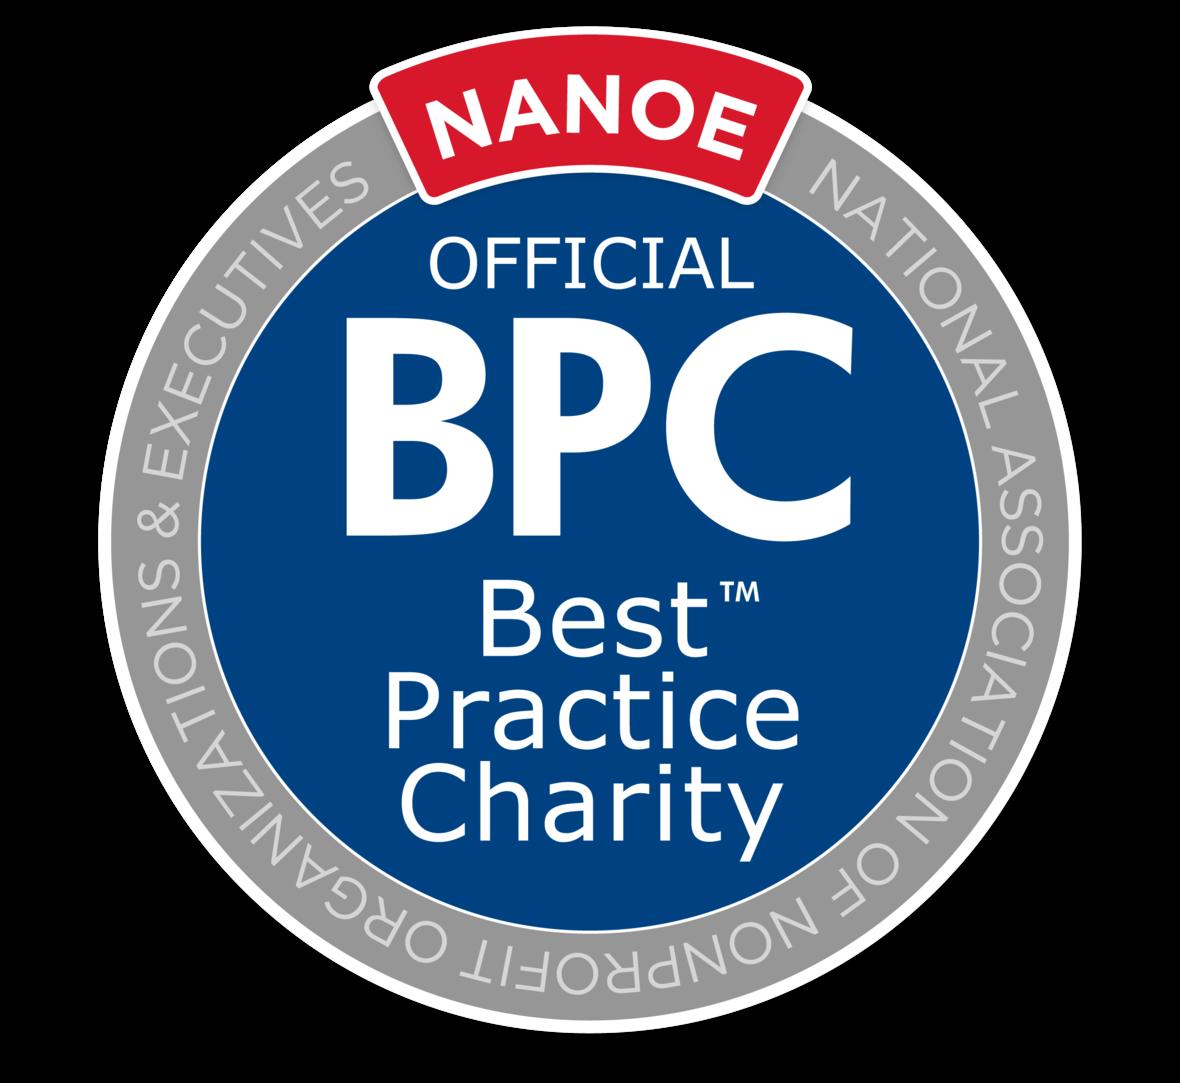 NANOE-BPC-HiRes